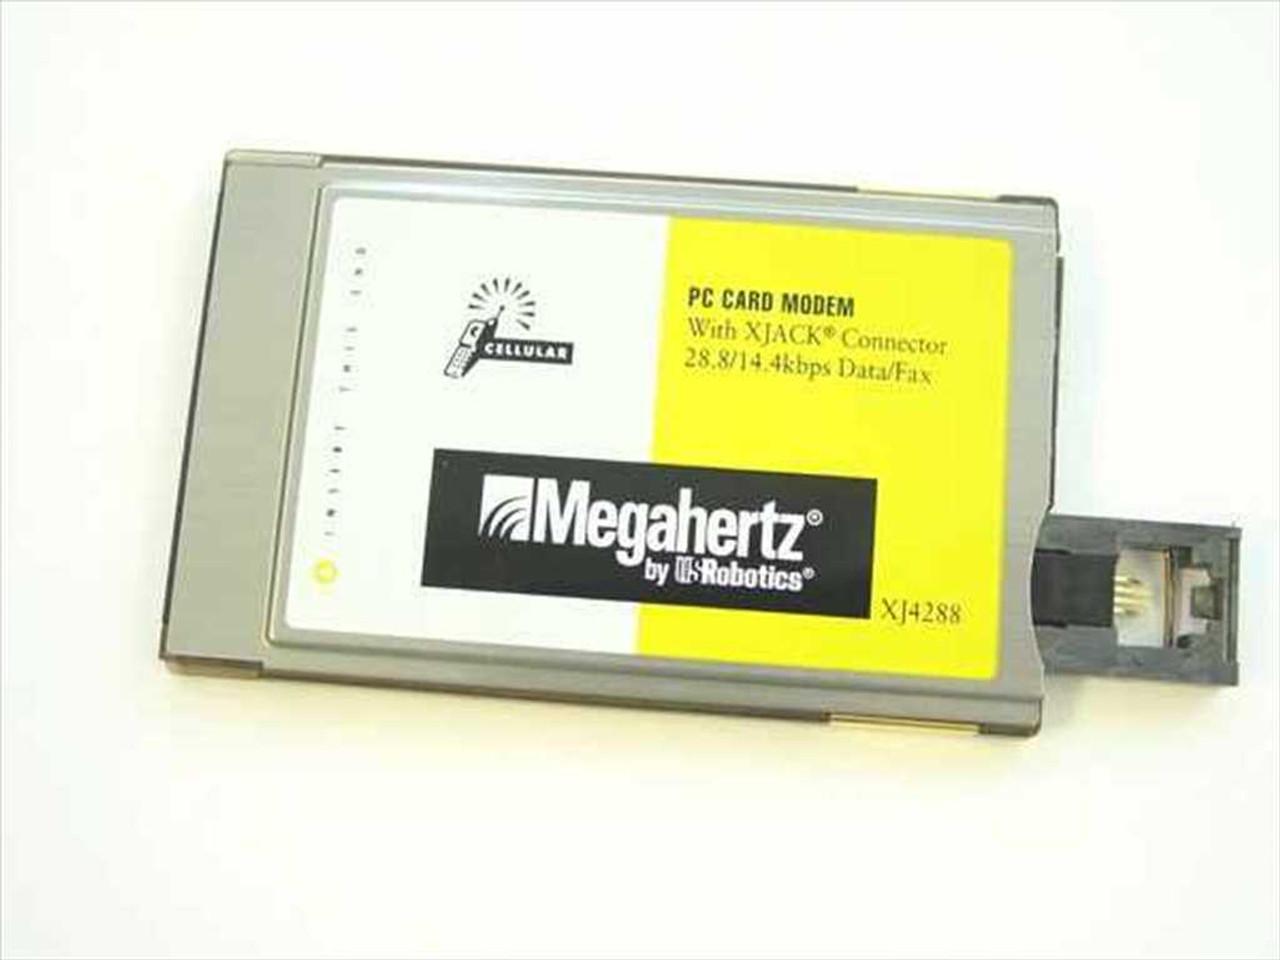 14.4 DATA FAX MODEM PCMCIA DRIVER